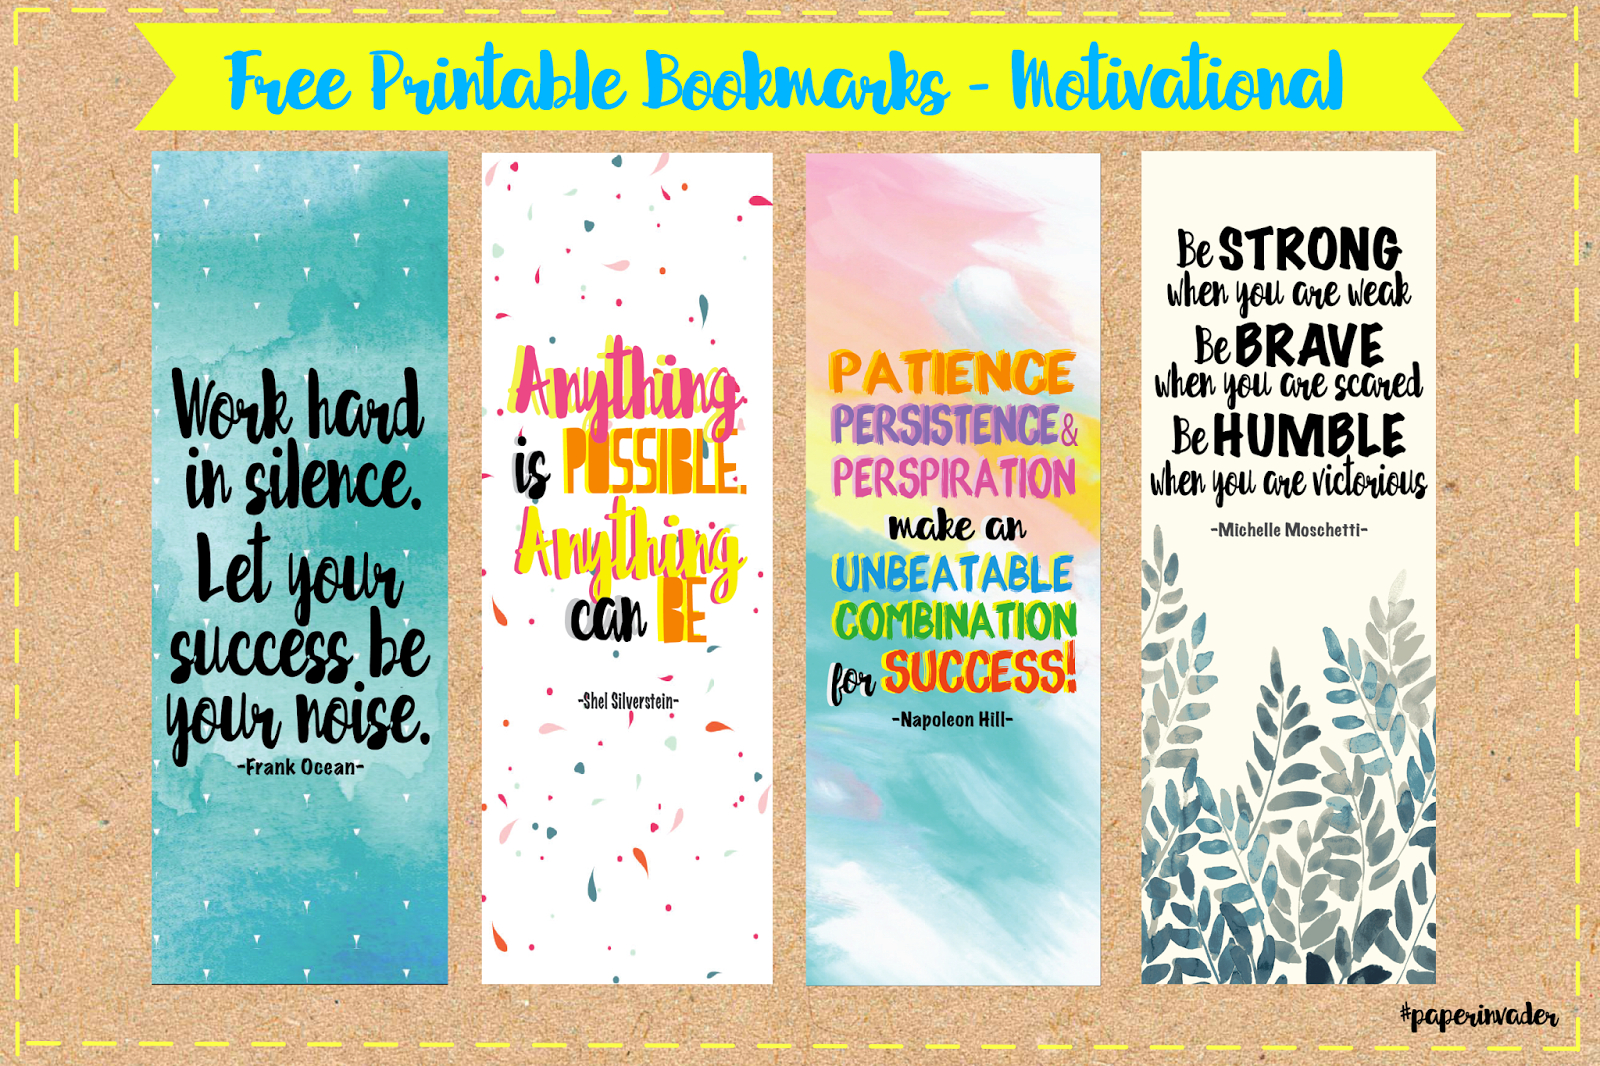 Paper Invader: Free Printable Bookmarks - Motivational - Free Printable Bookmarks